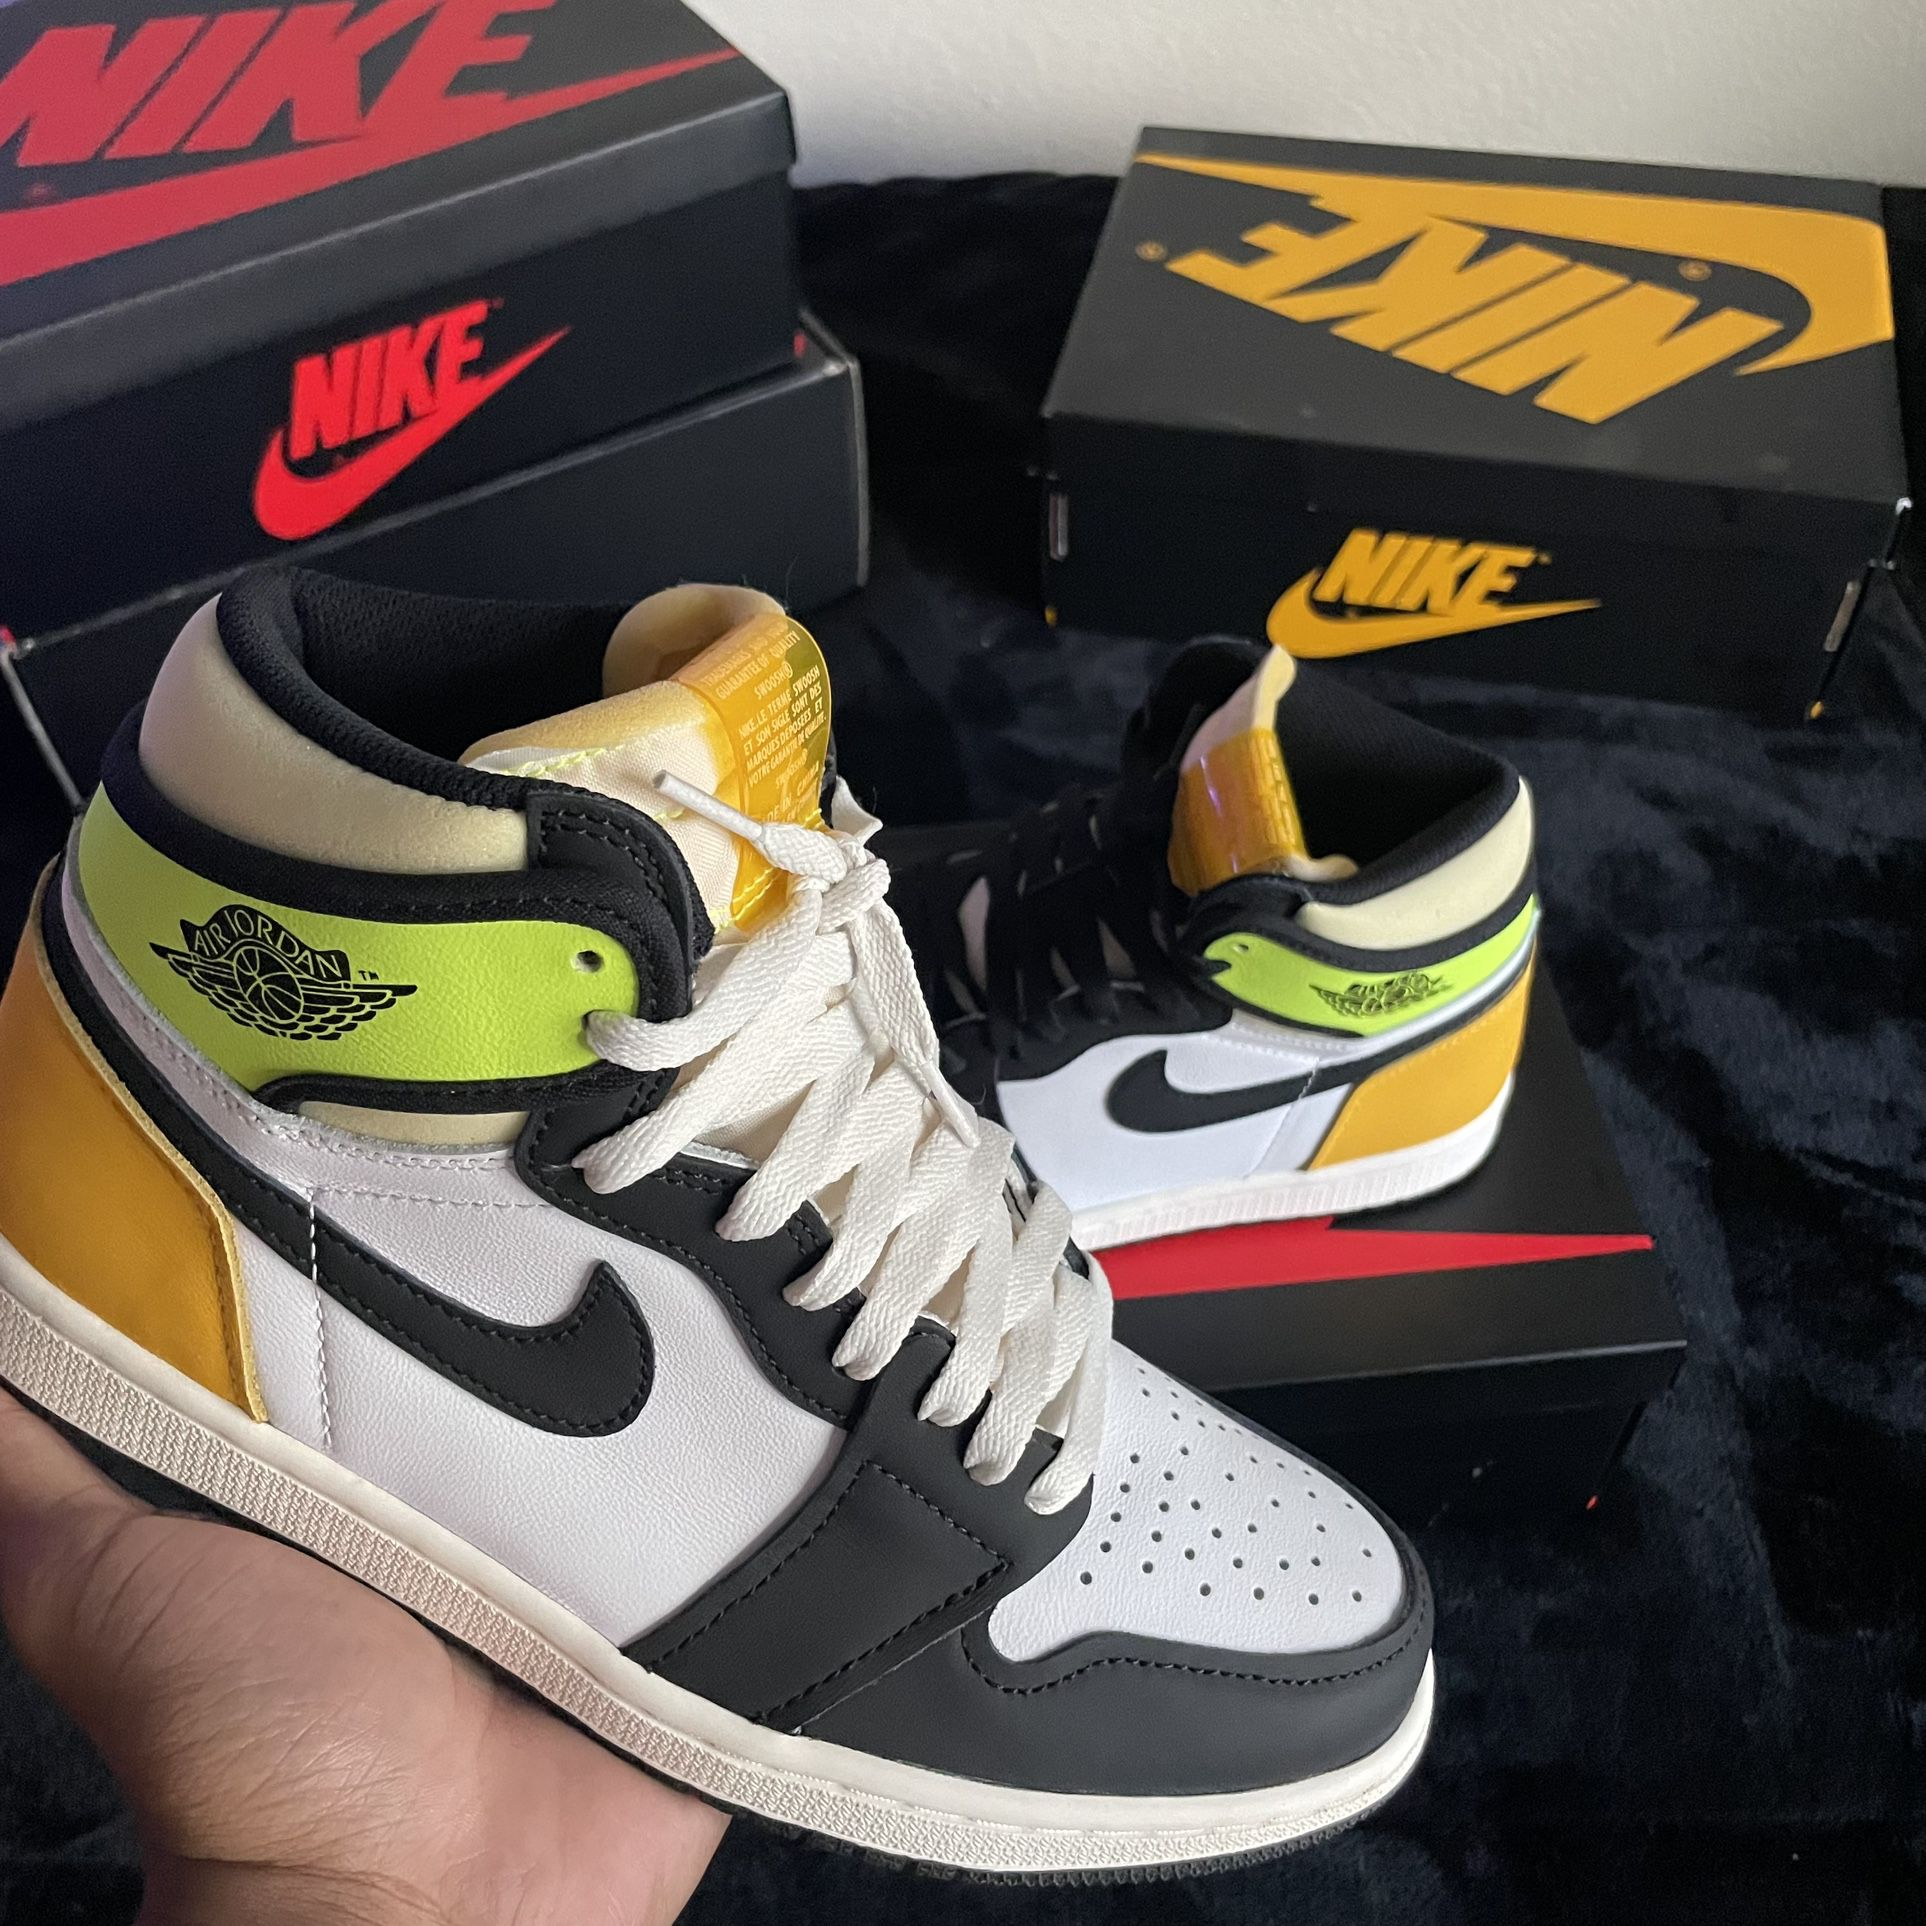 Jordan 1 High ' Volt Gold '